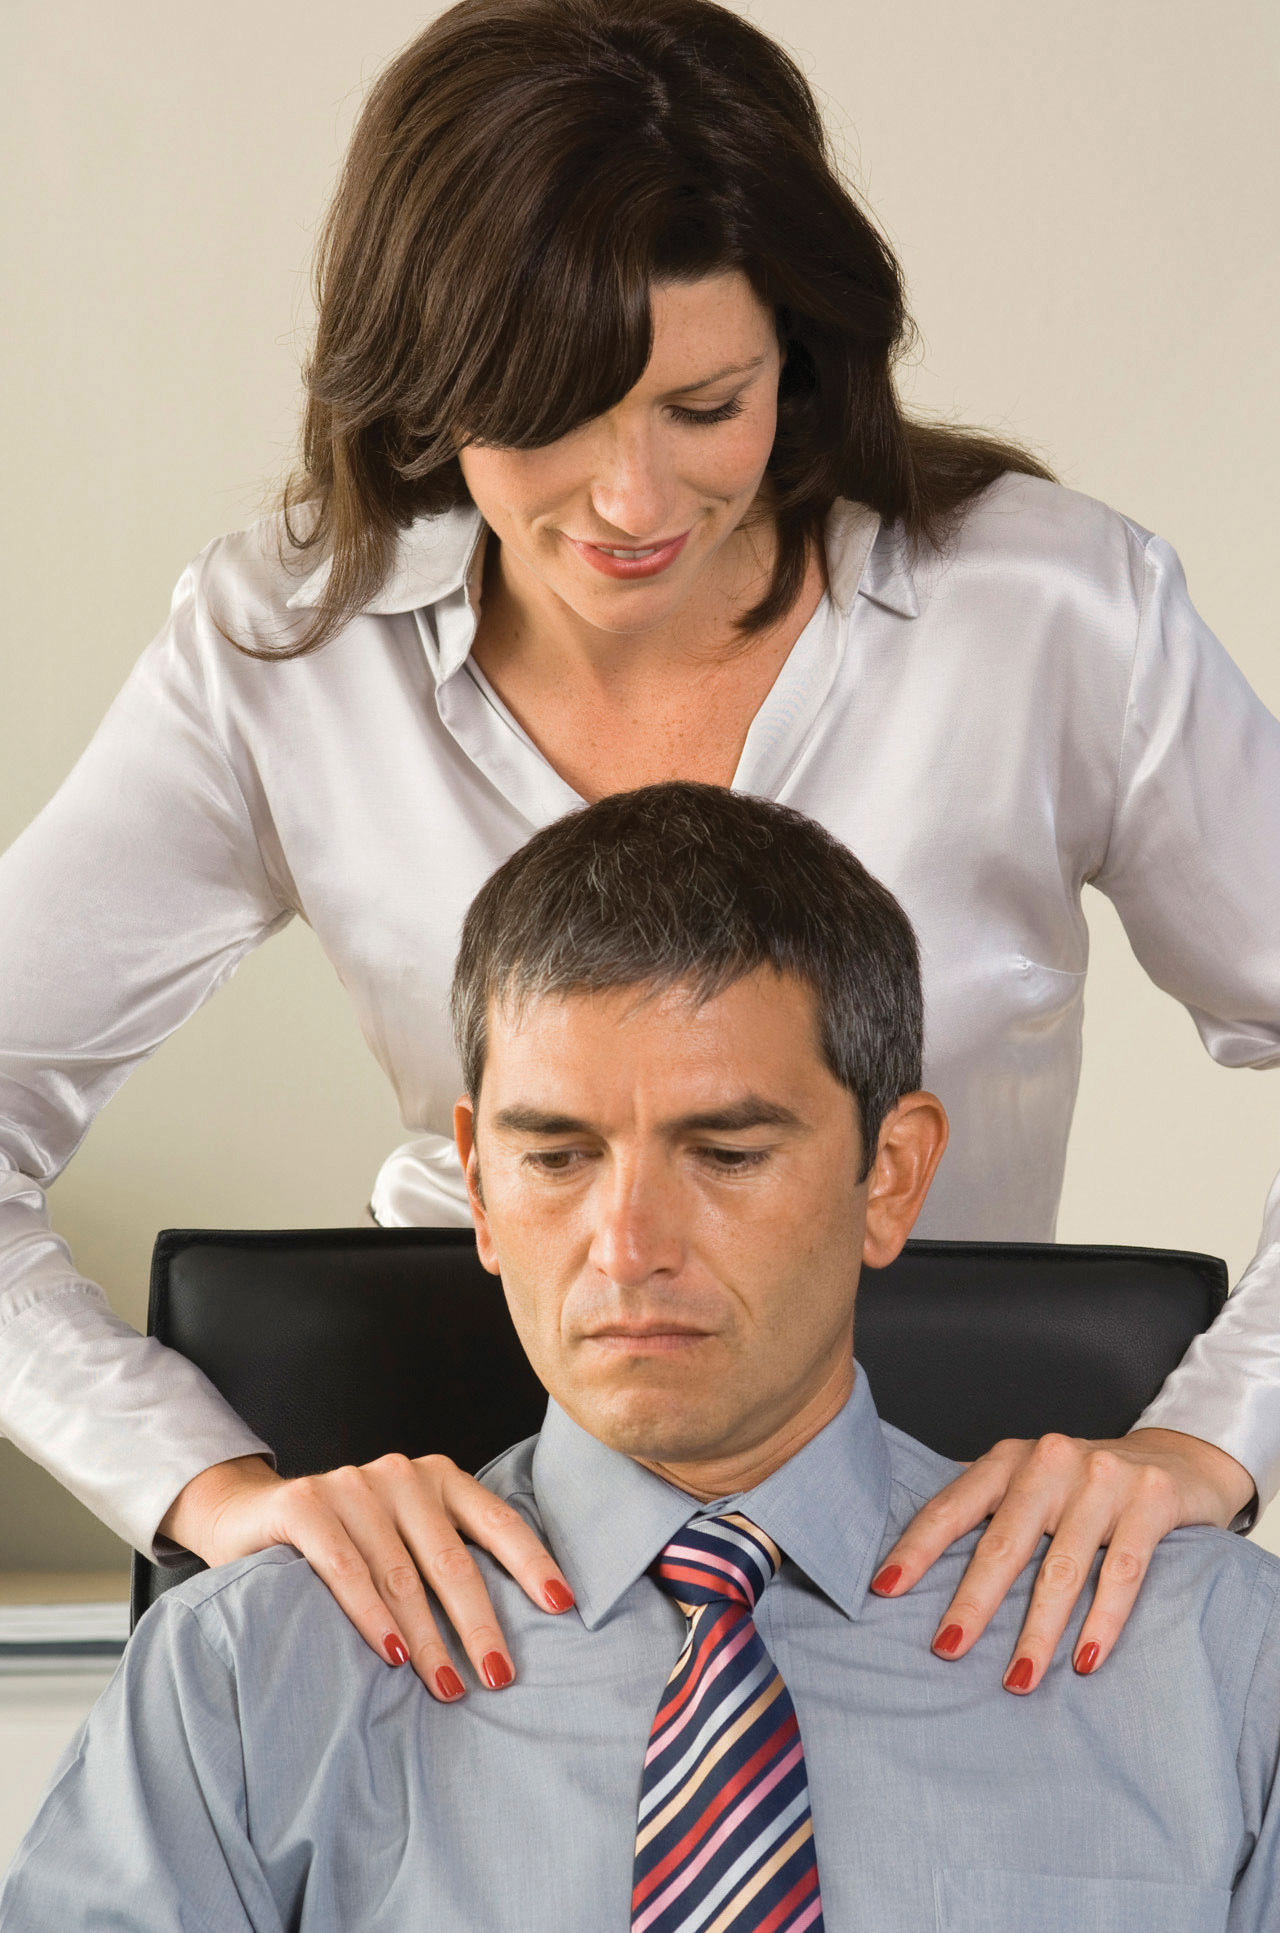 Sexual harassment of men cases